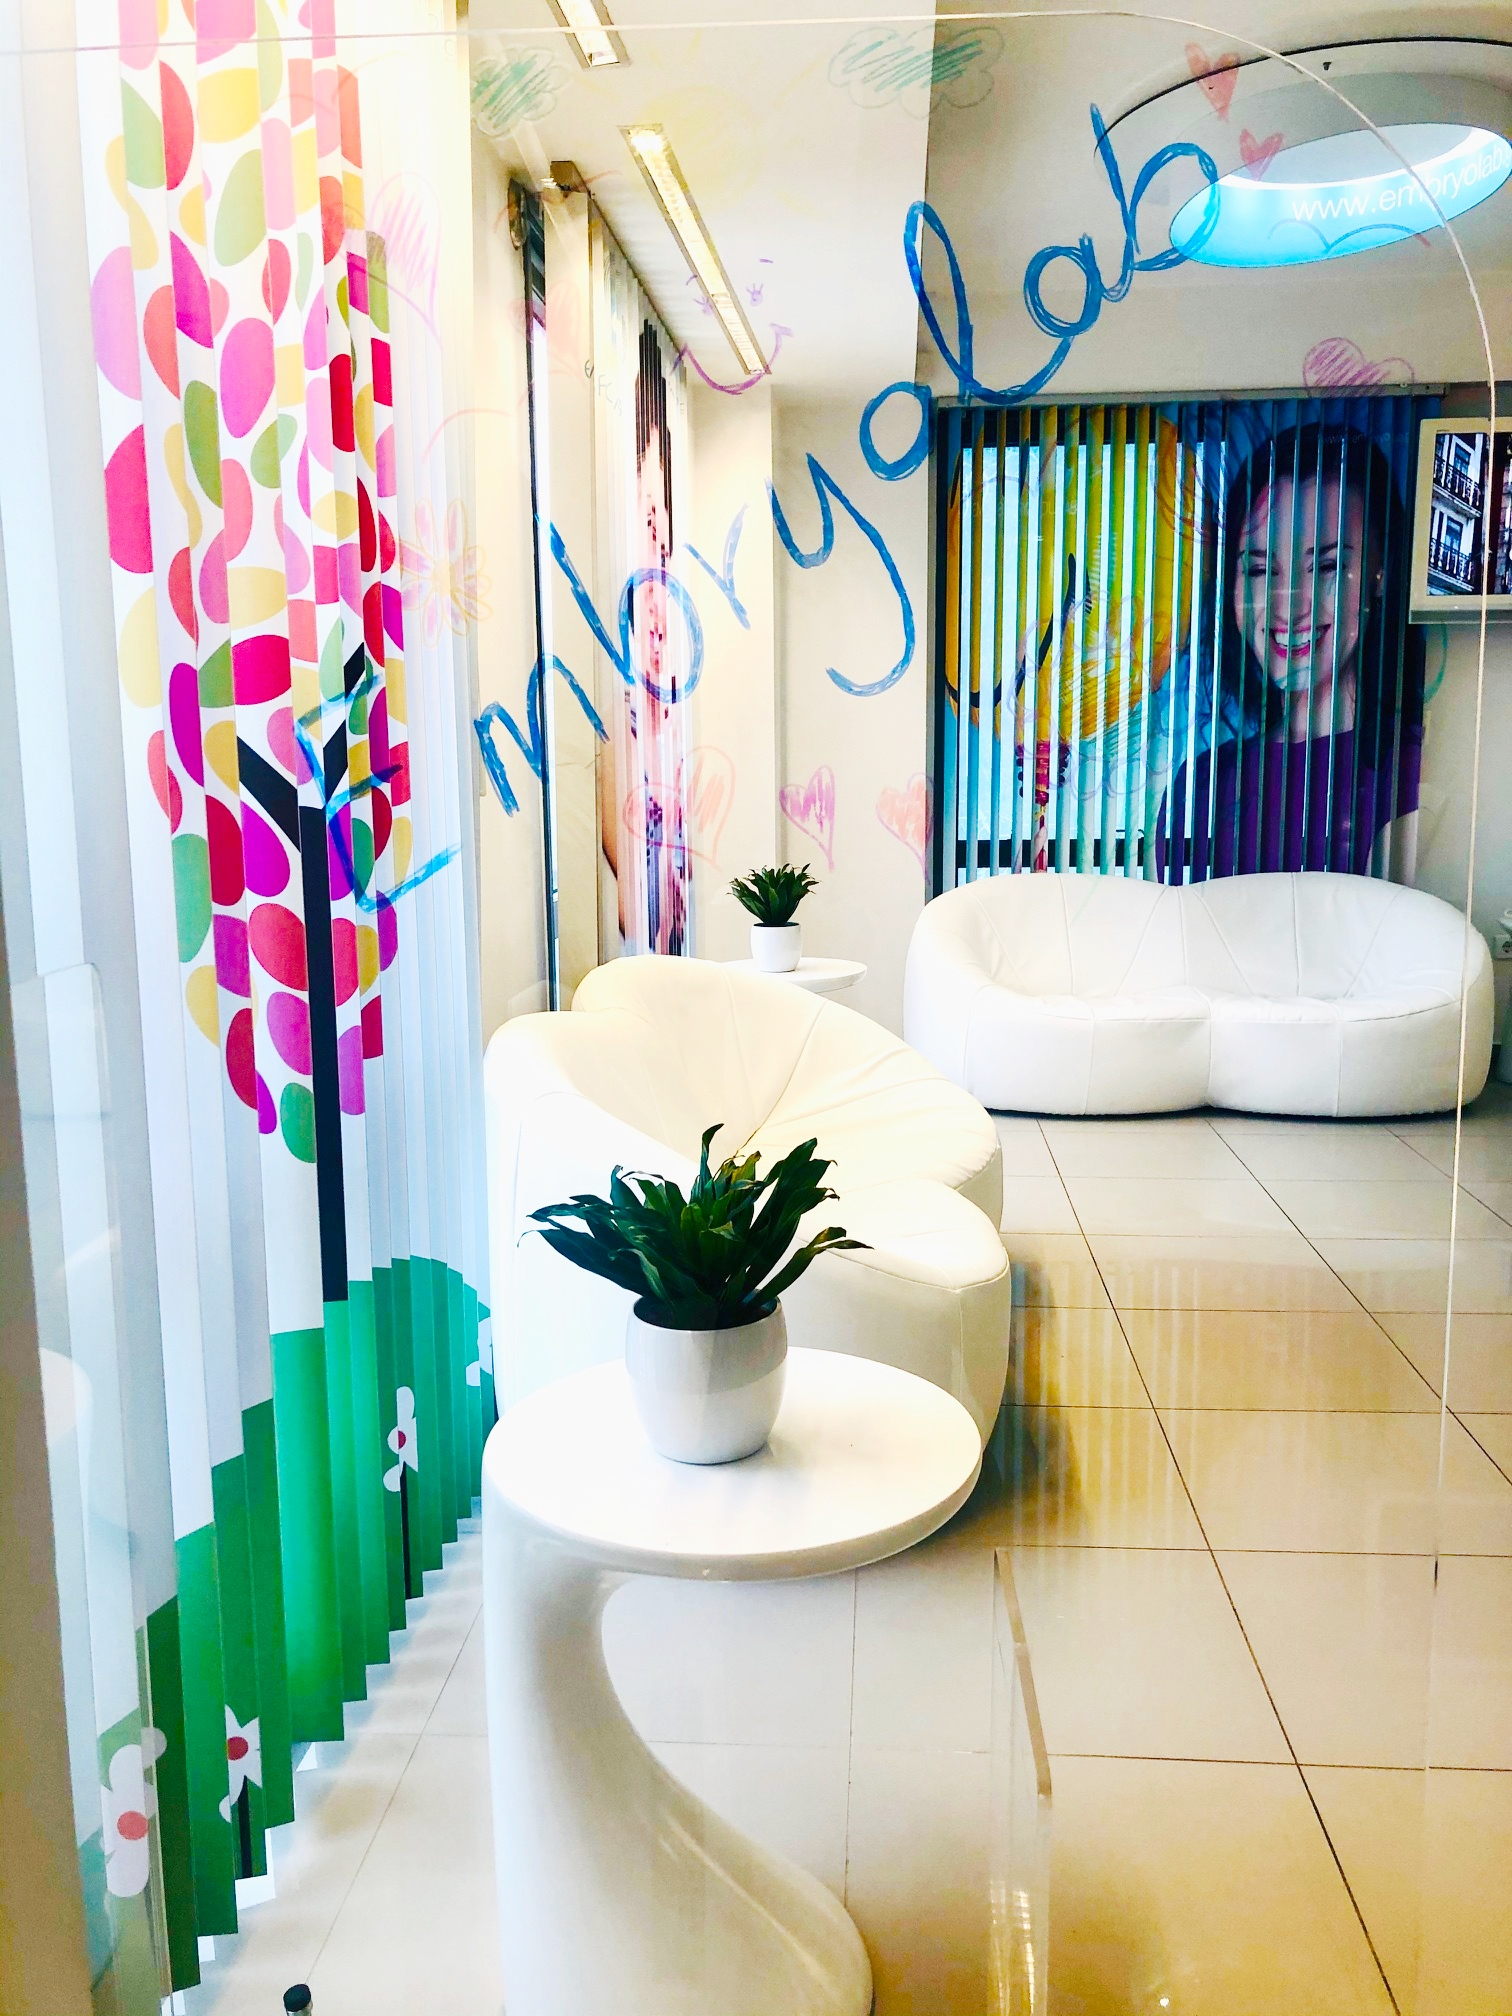 Embryolab waiting room